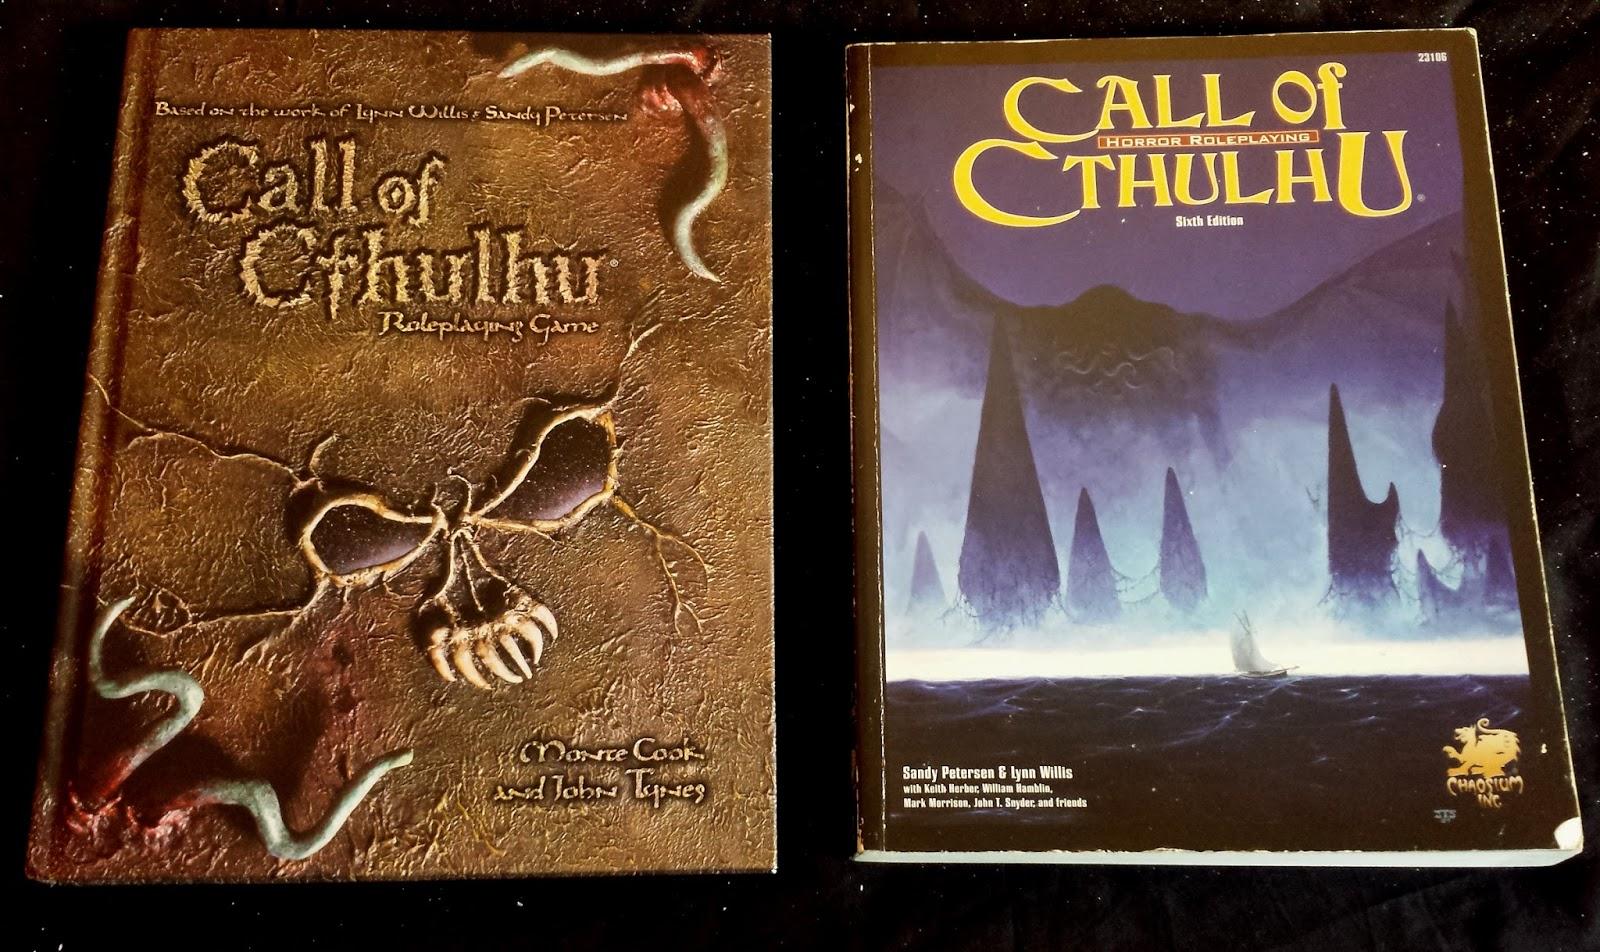 CALL OF CTHULHU D20 EBOOK